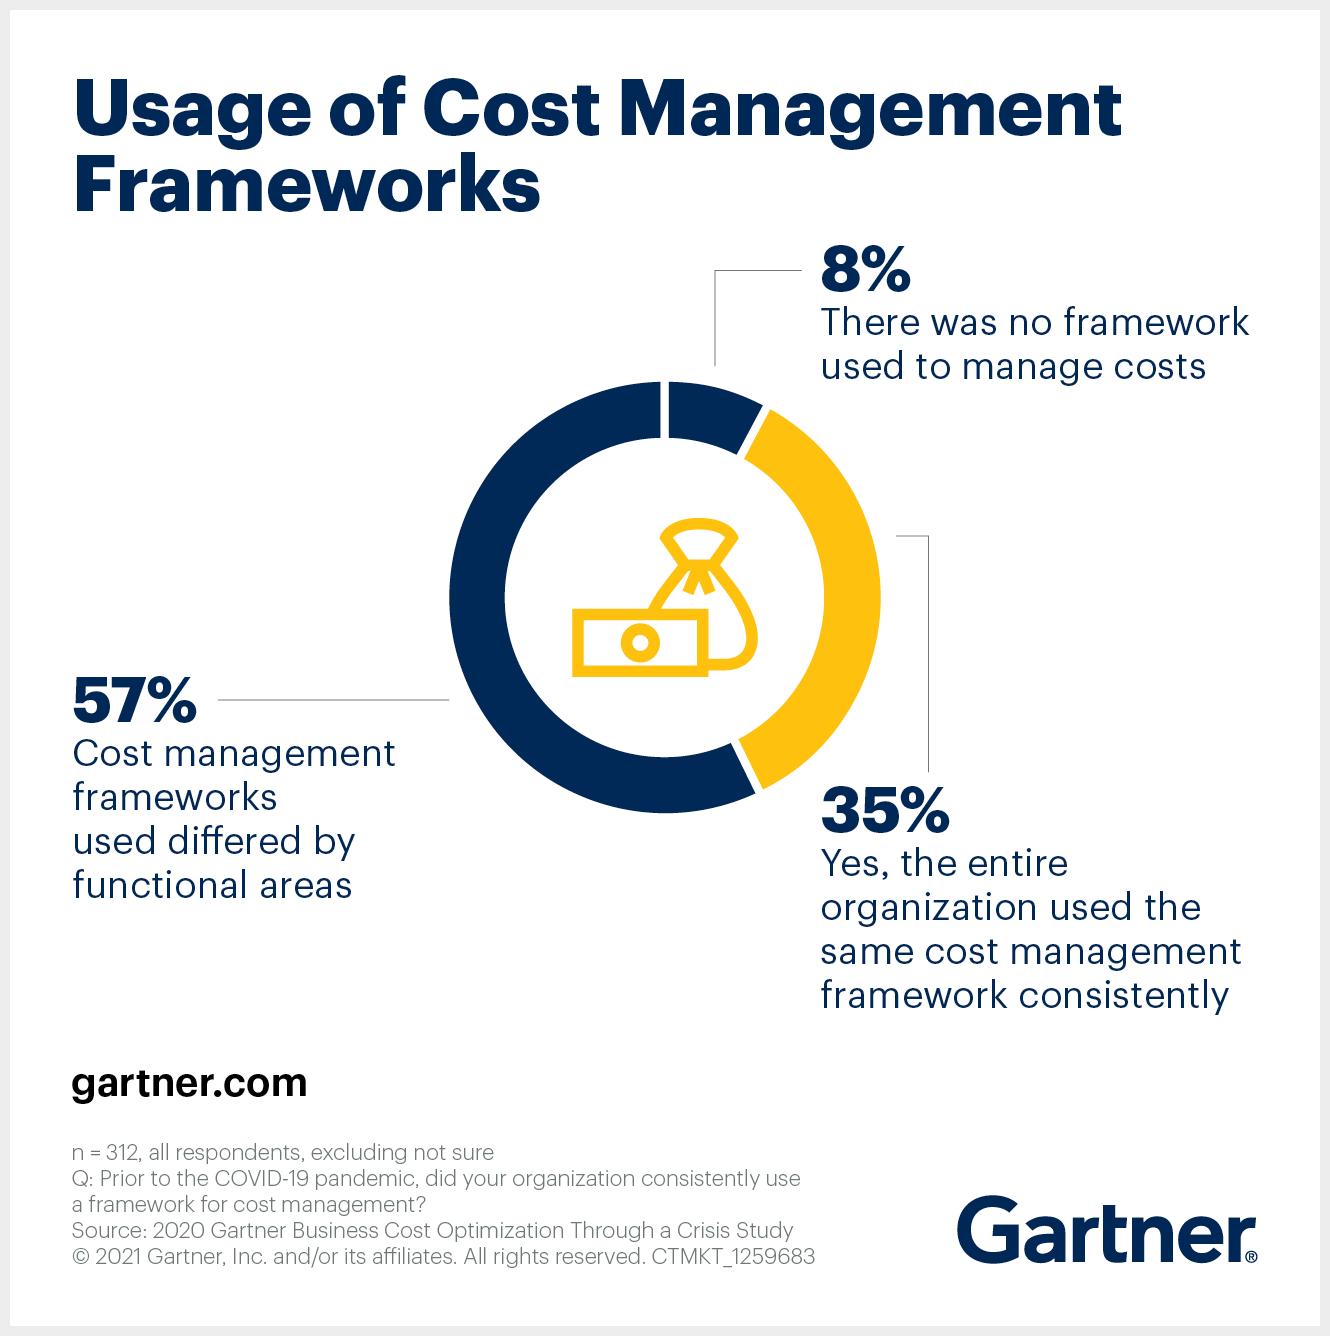 Cost Management Frameworks for Cost Optimization